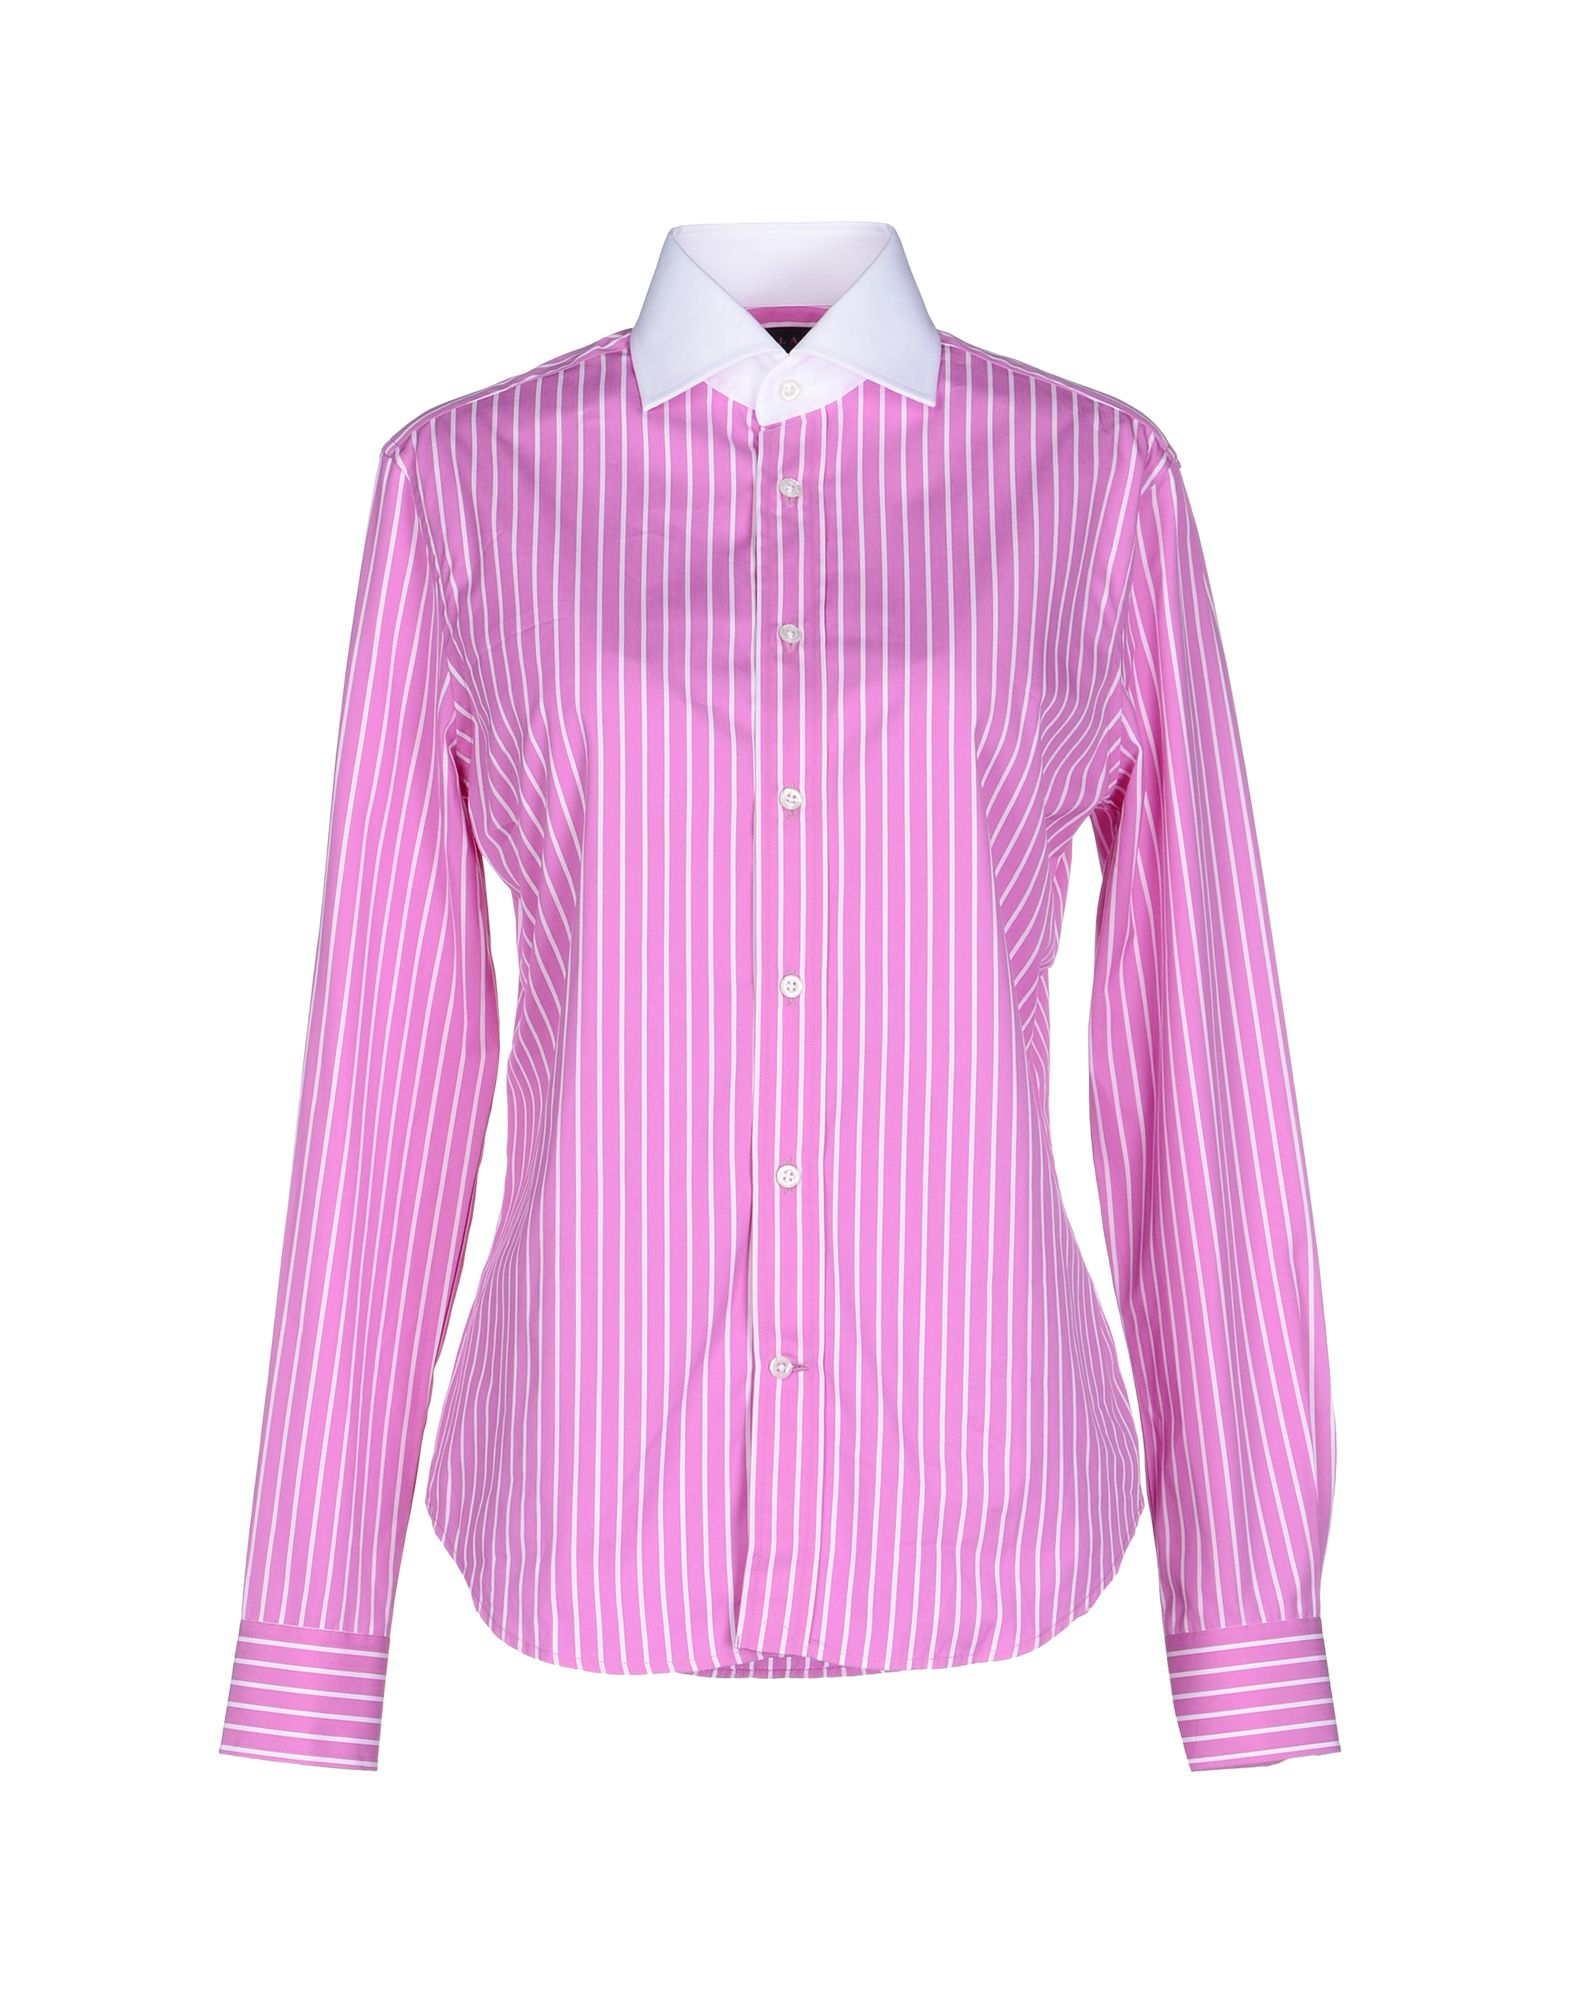 Ralph lauren black label shirt in purple lyst for Black ralph lauren shirt purple horse